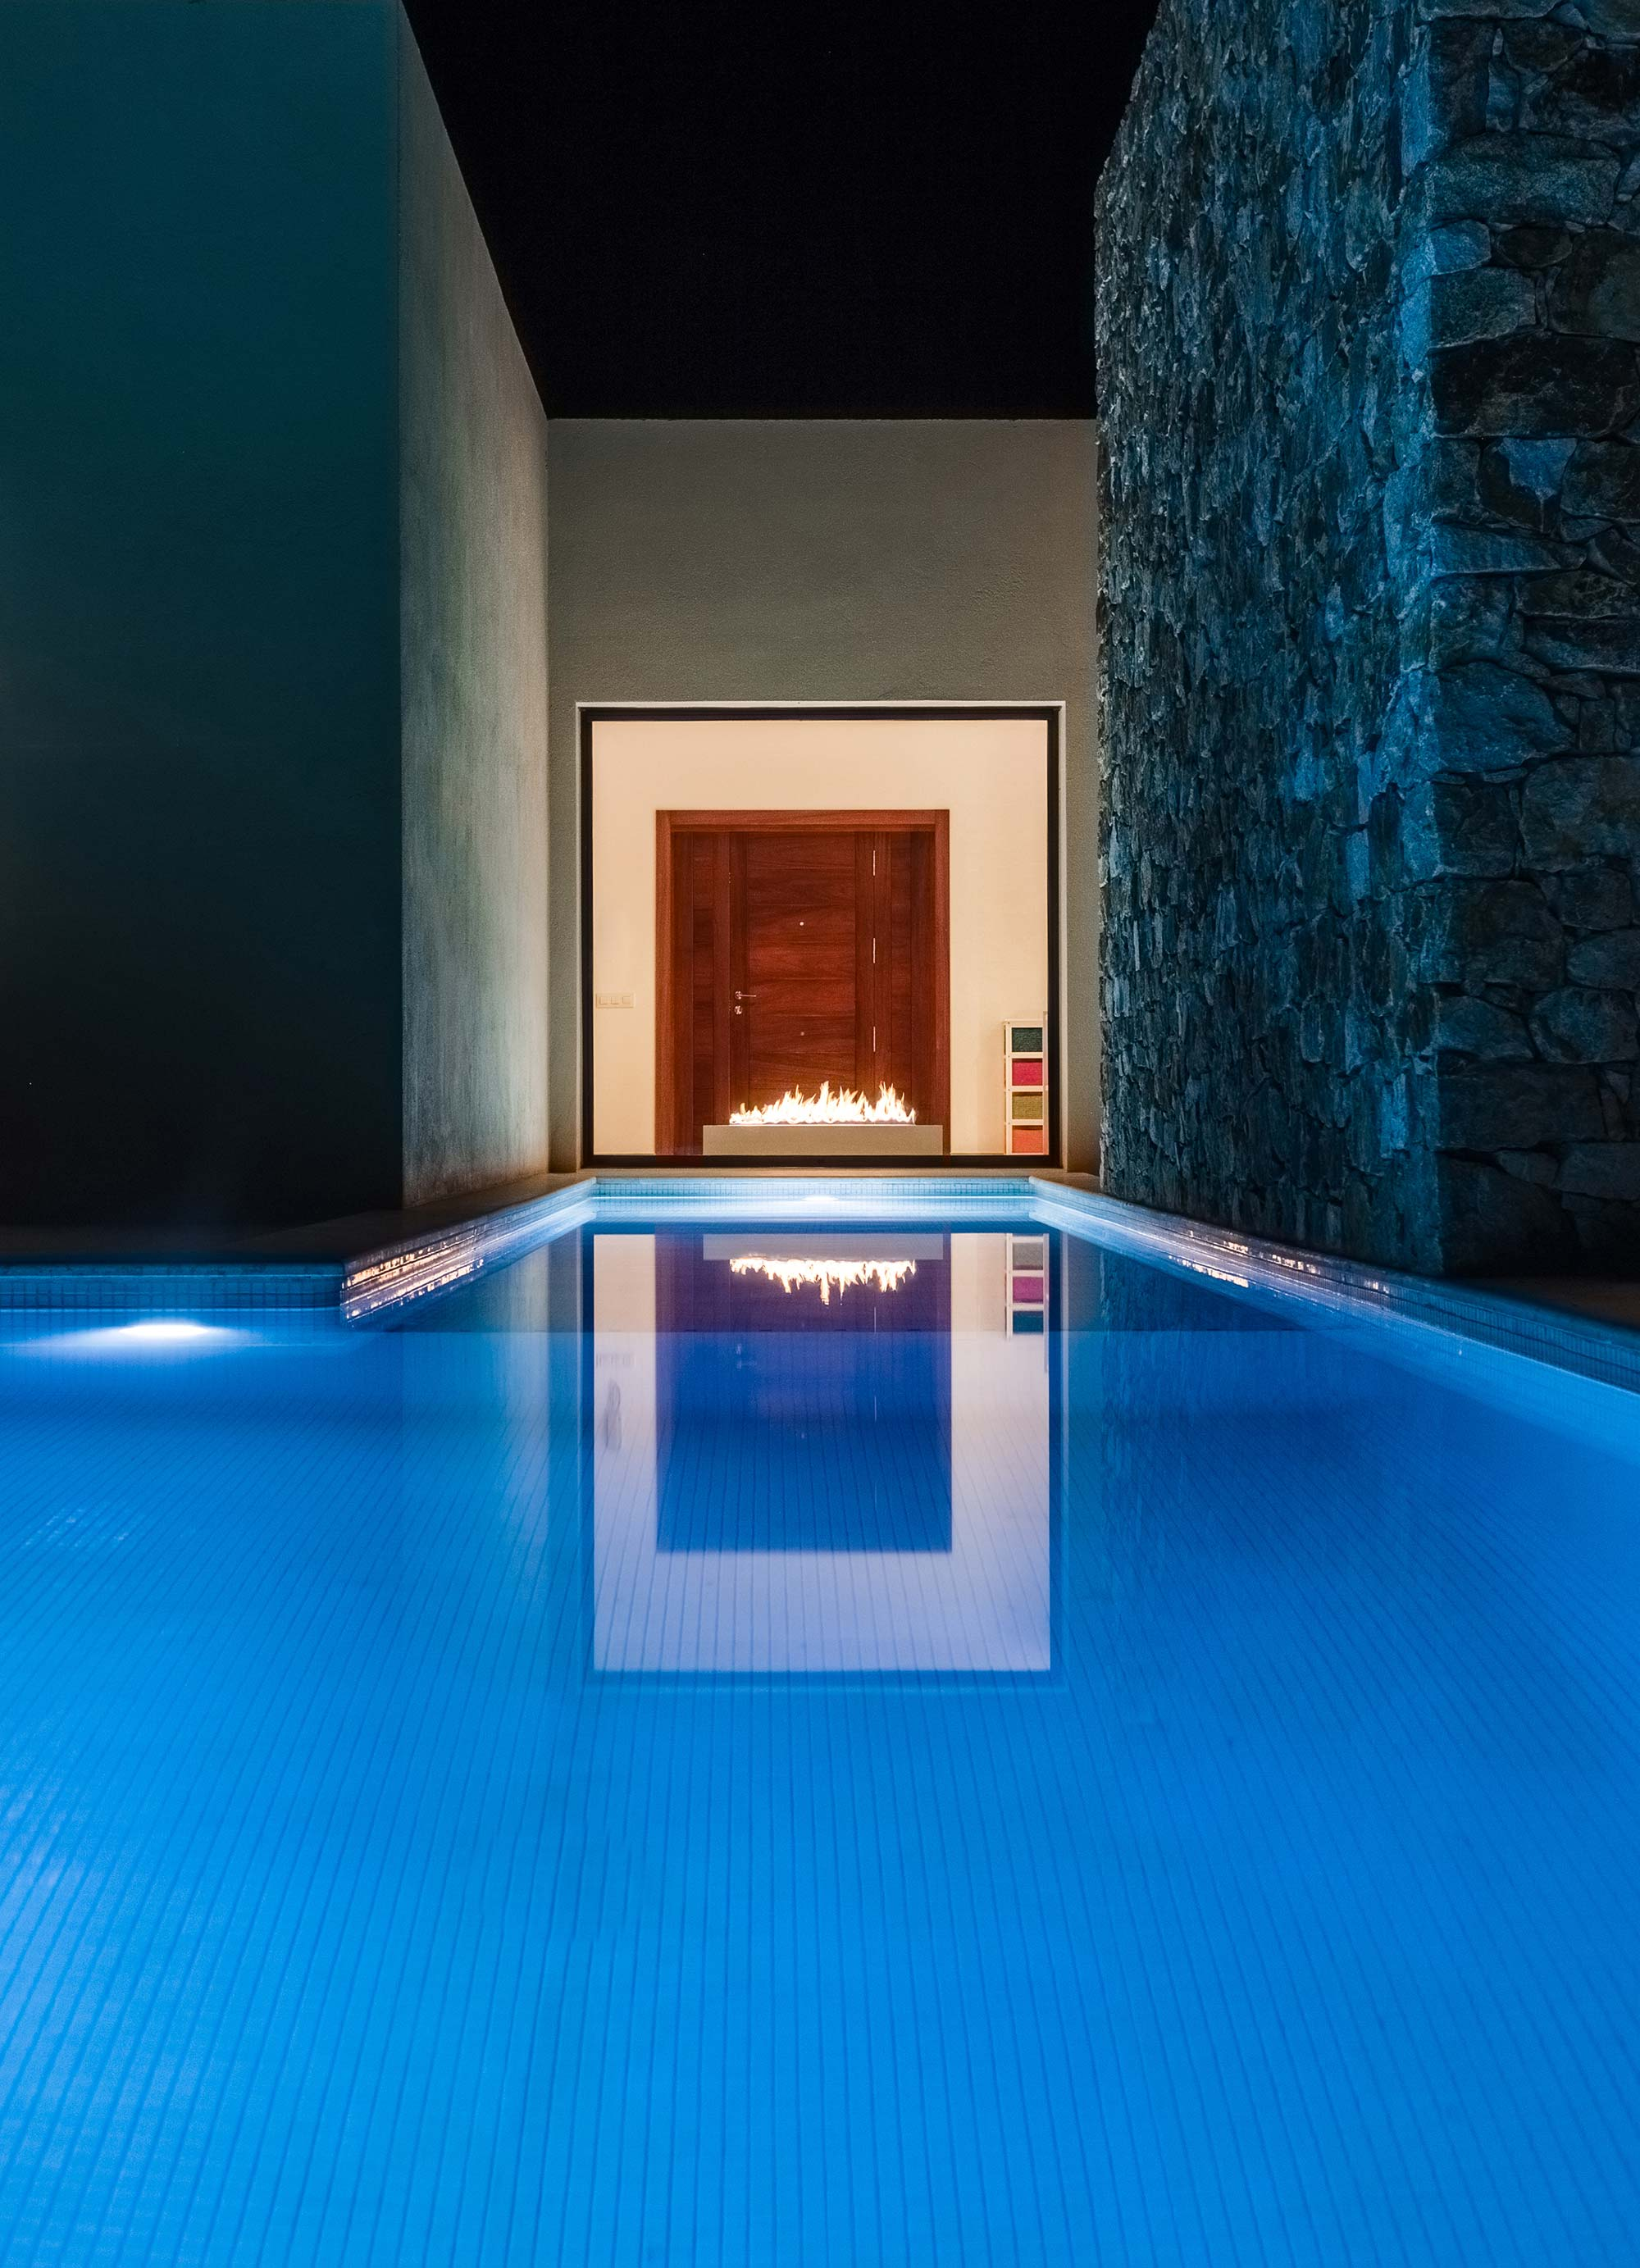 FLA3_Girona-Spain_private-residence-fot.-Michal-Kugacz.jpg